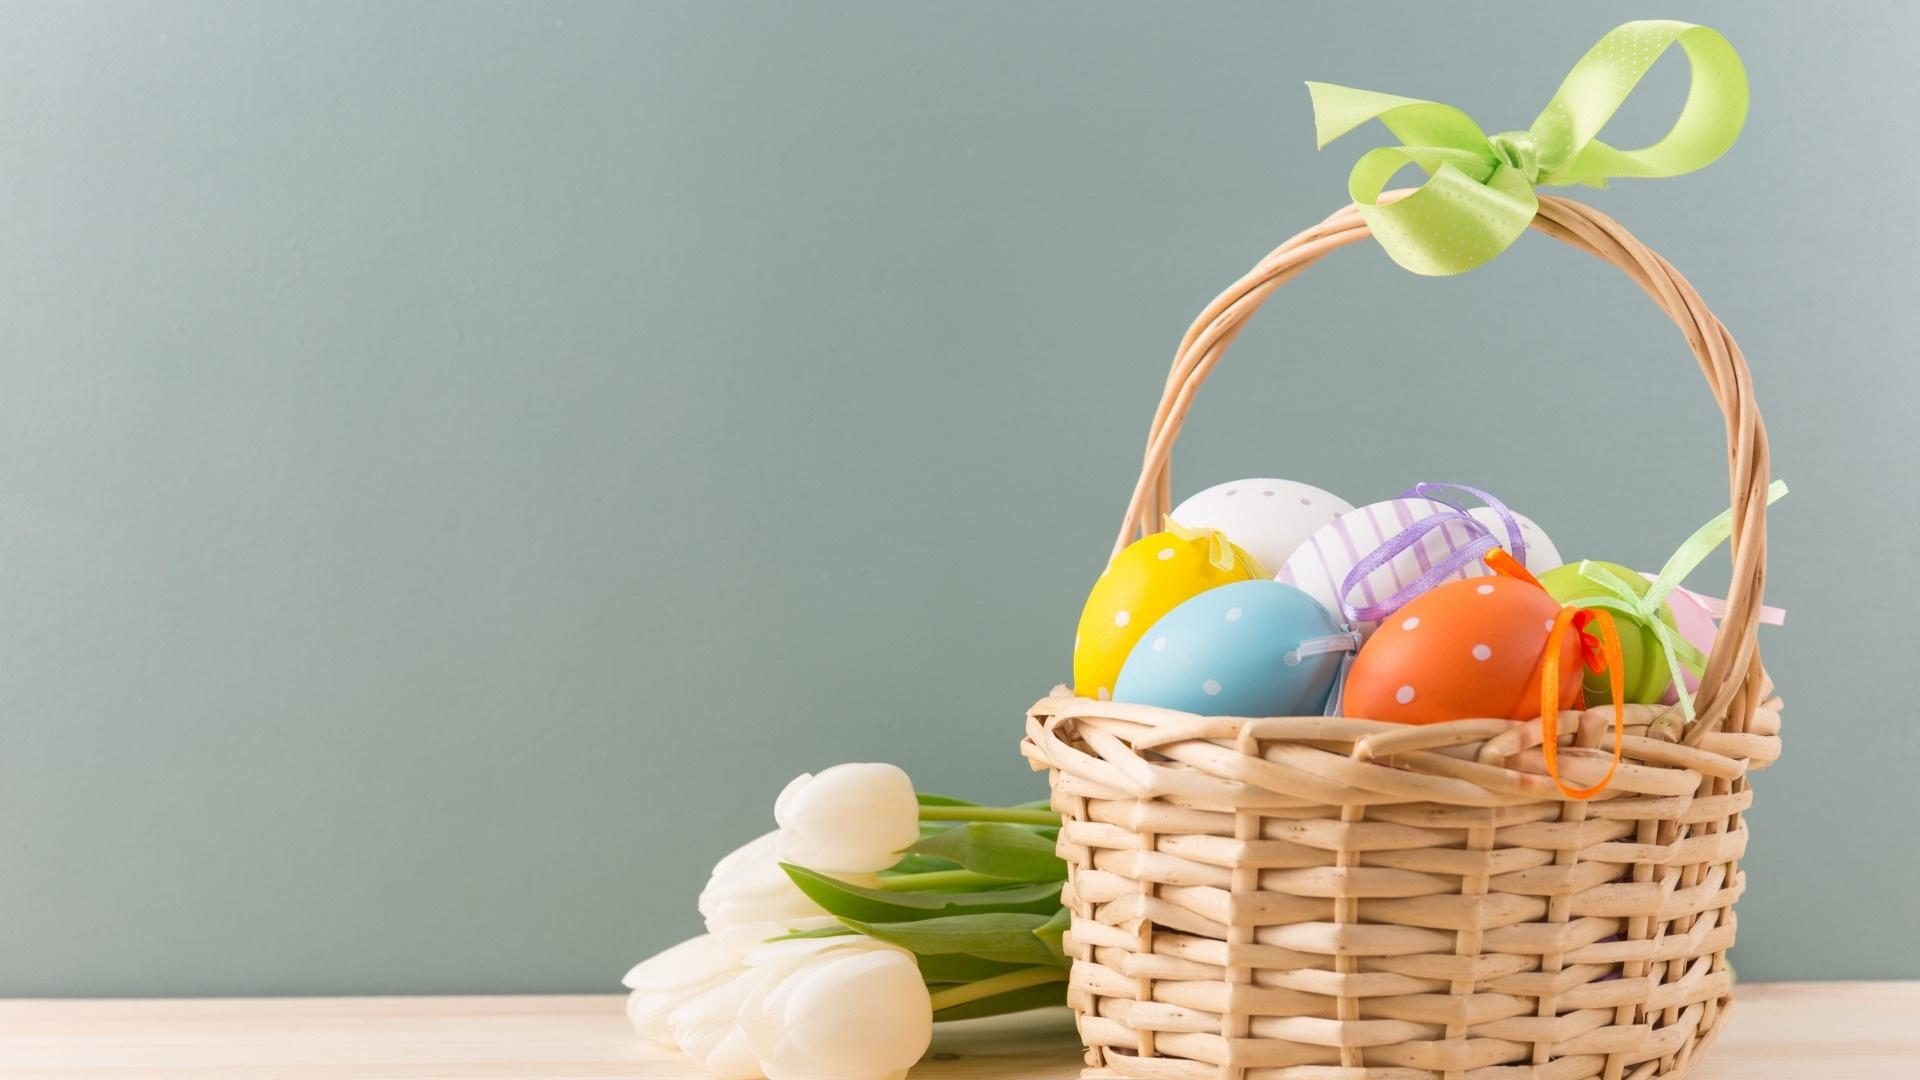 Easter Eggs In A Basket Desktop Wallpaper